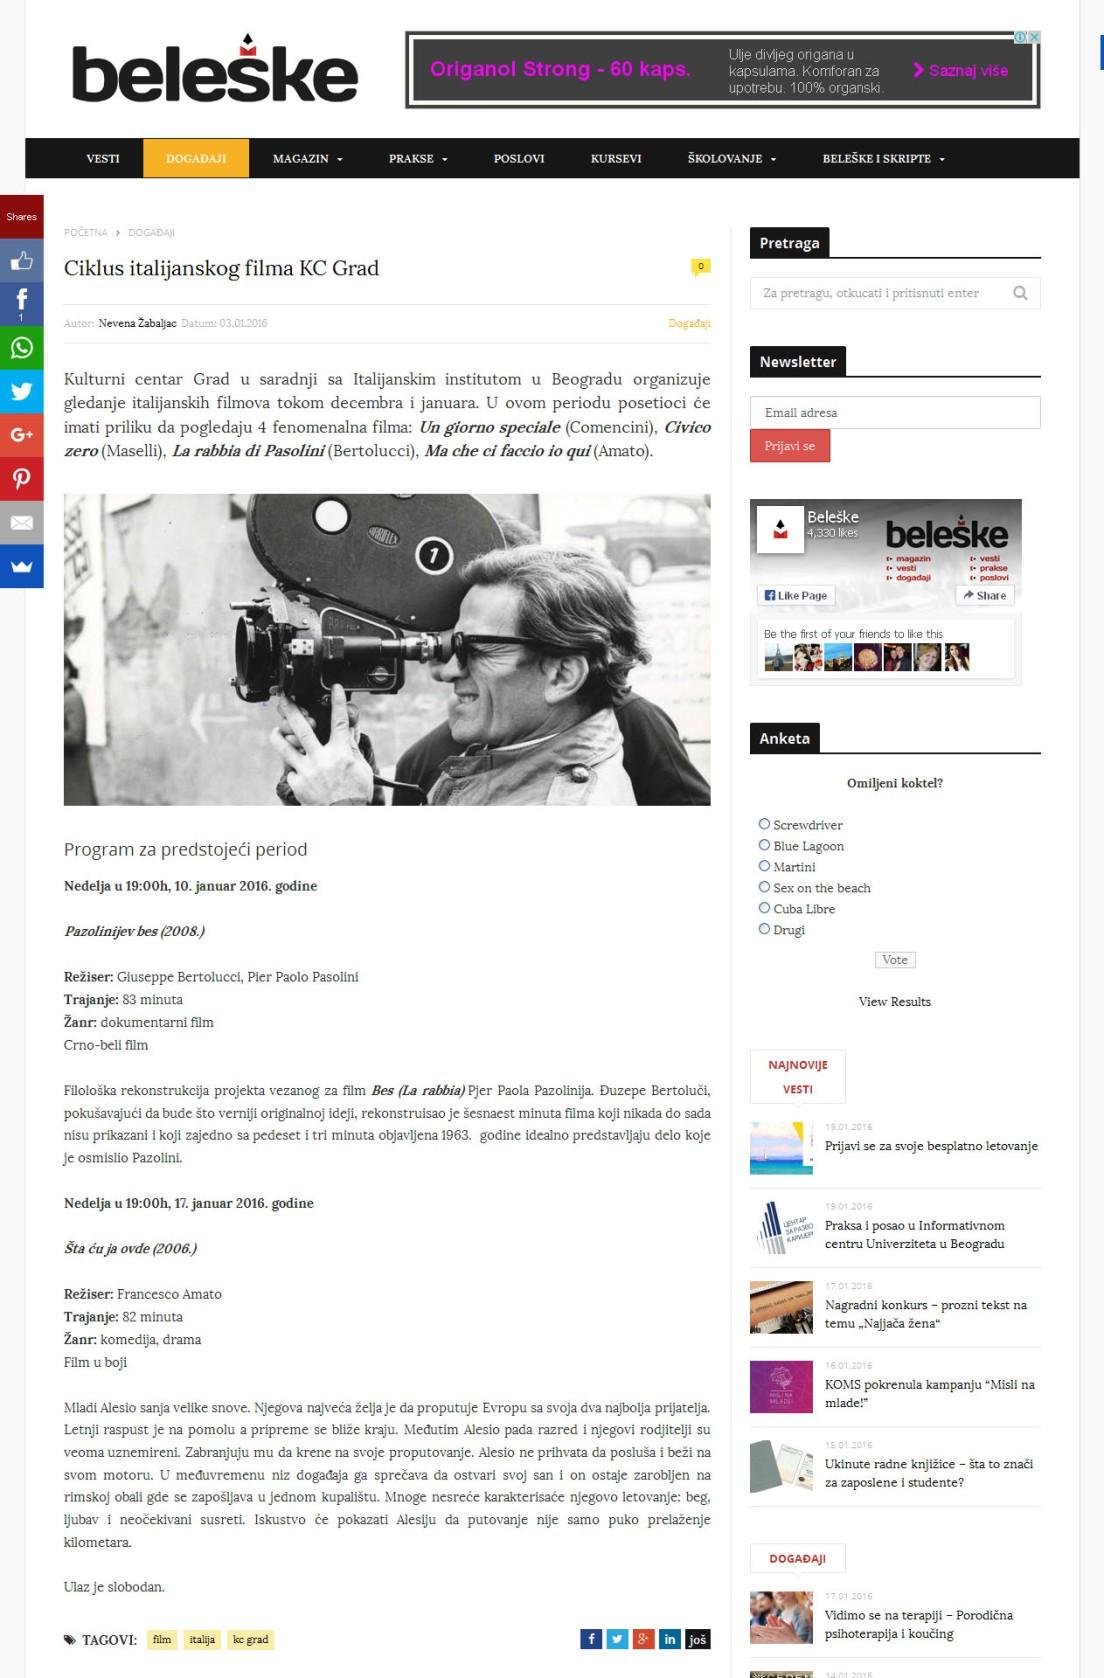 0301 - beleske.com - Ciklus italijanskog filma KC Grad